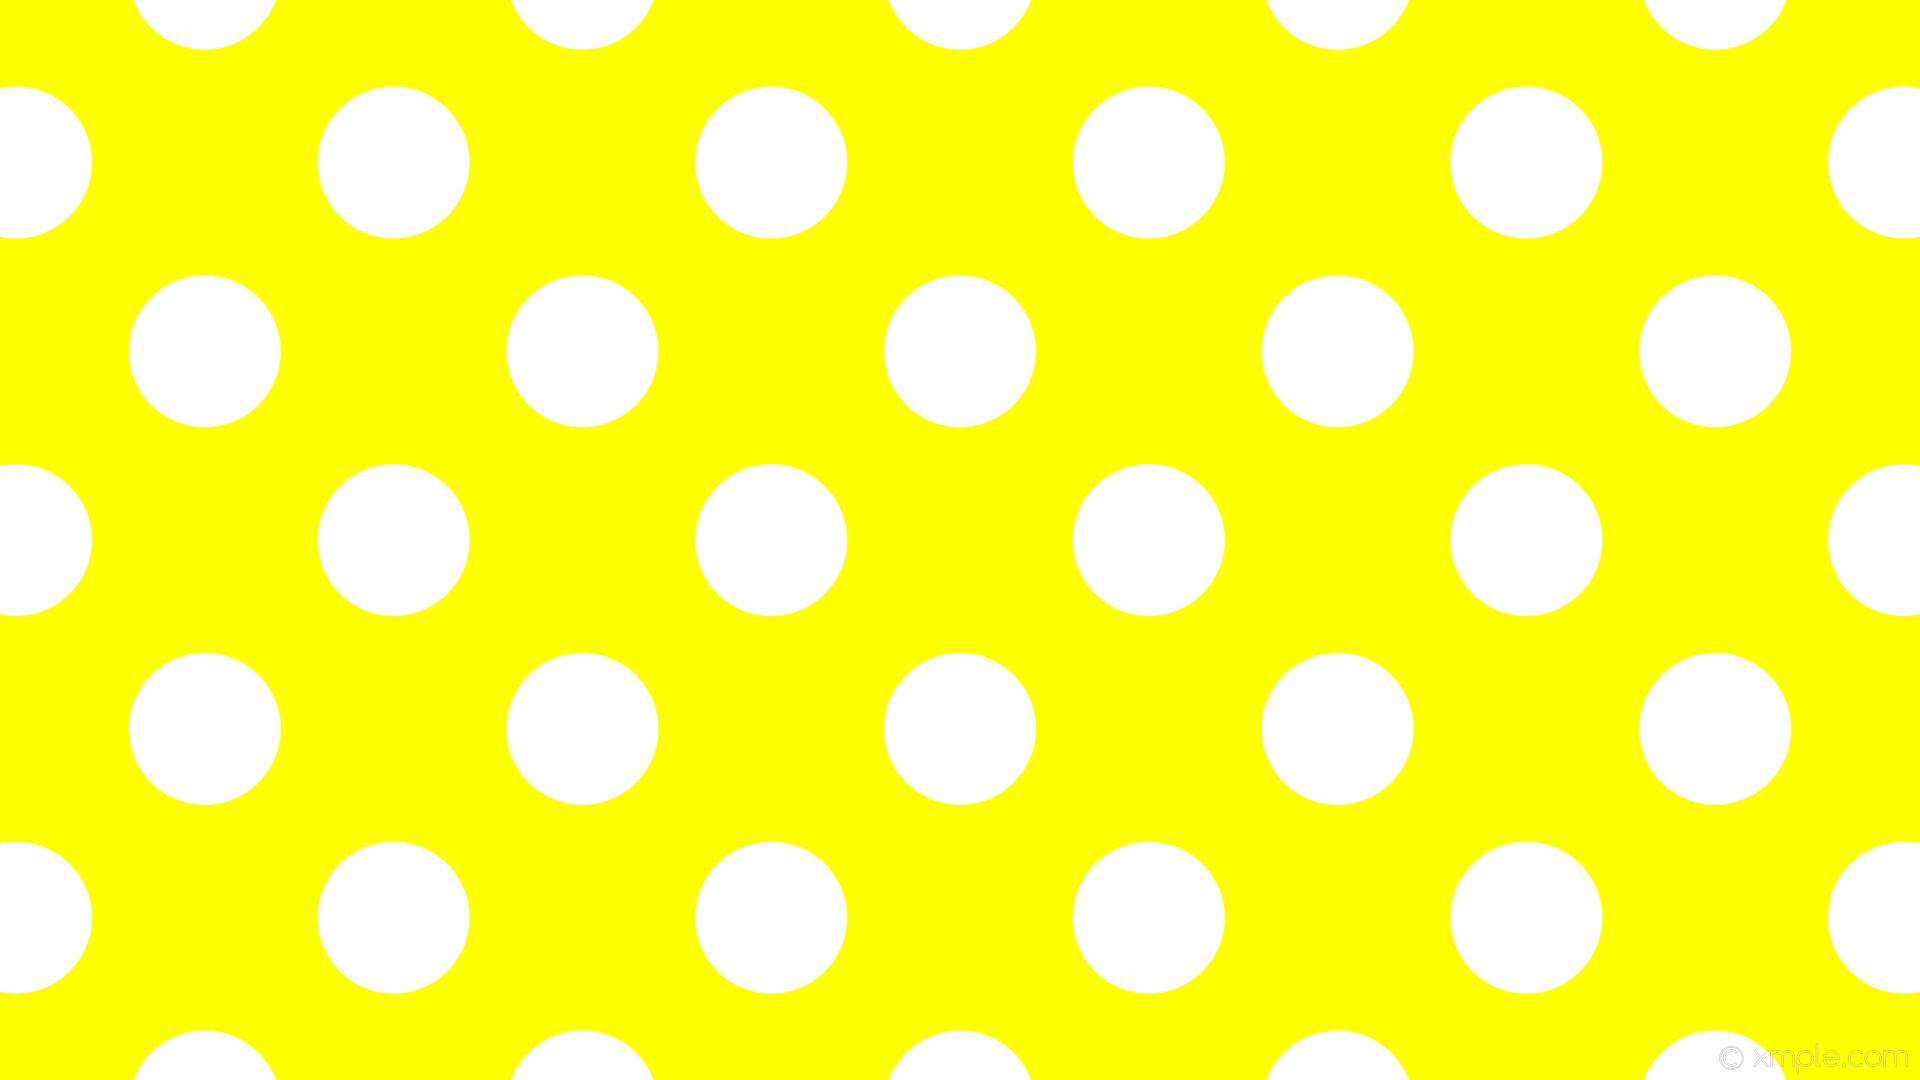 yellow polka dot background free stock photo public domain pictures